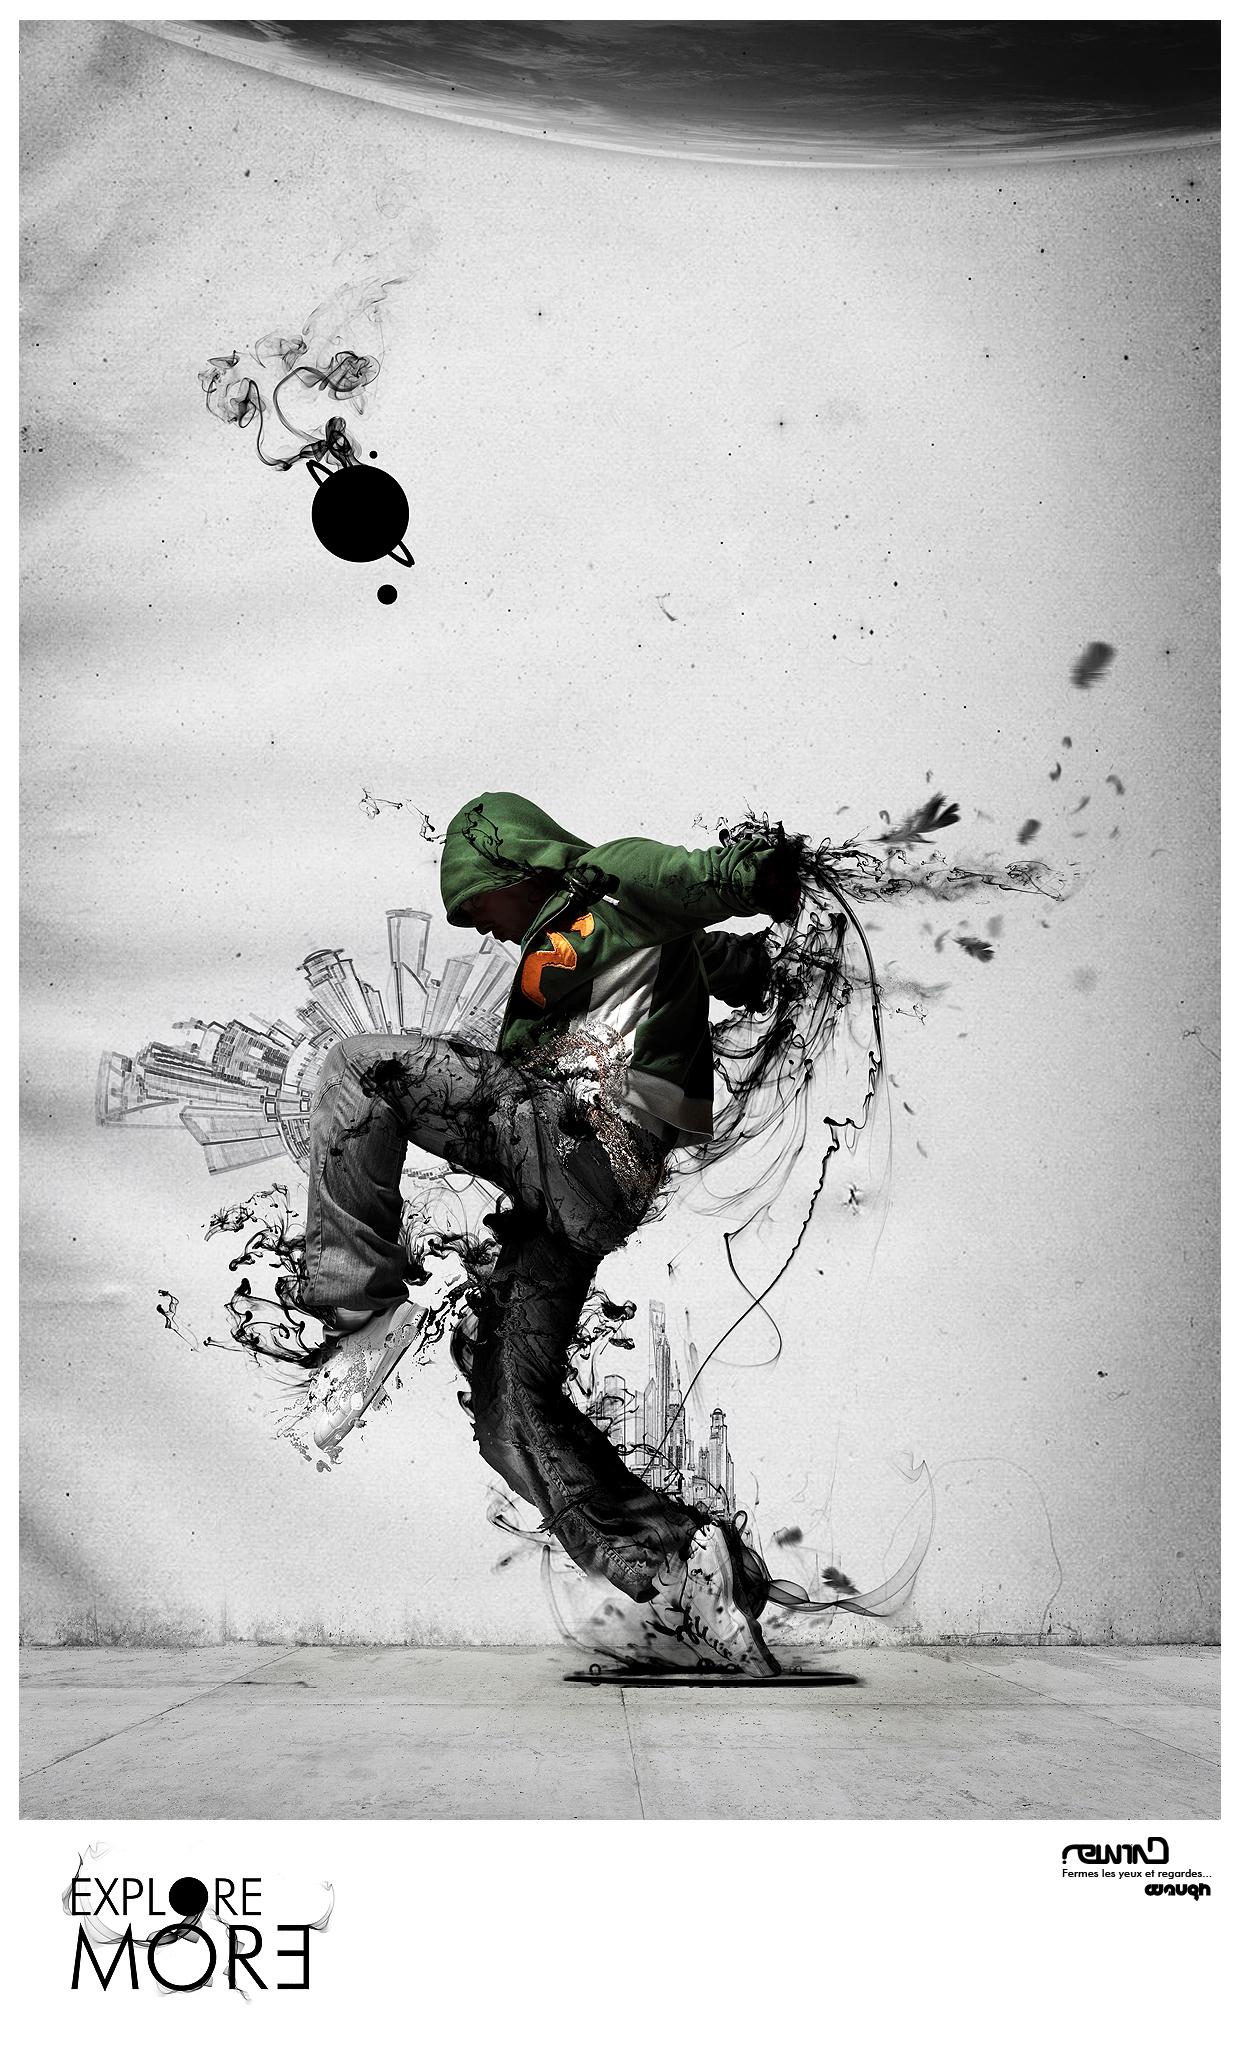 Wallpaper Laki Laki Gambar Lukisan Ilustrasi Seni Digital